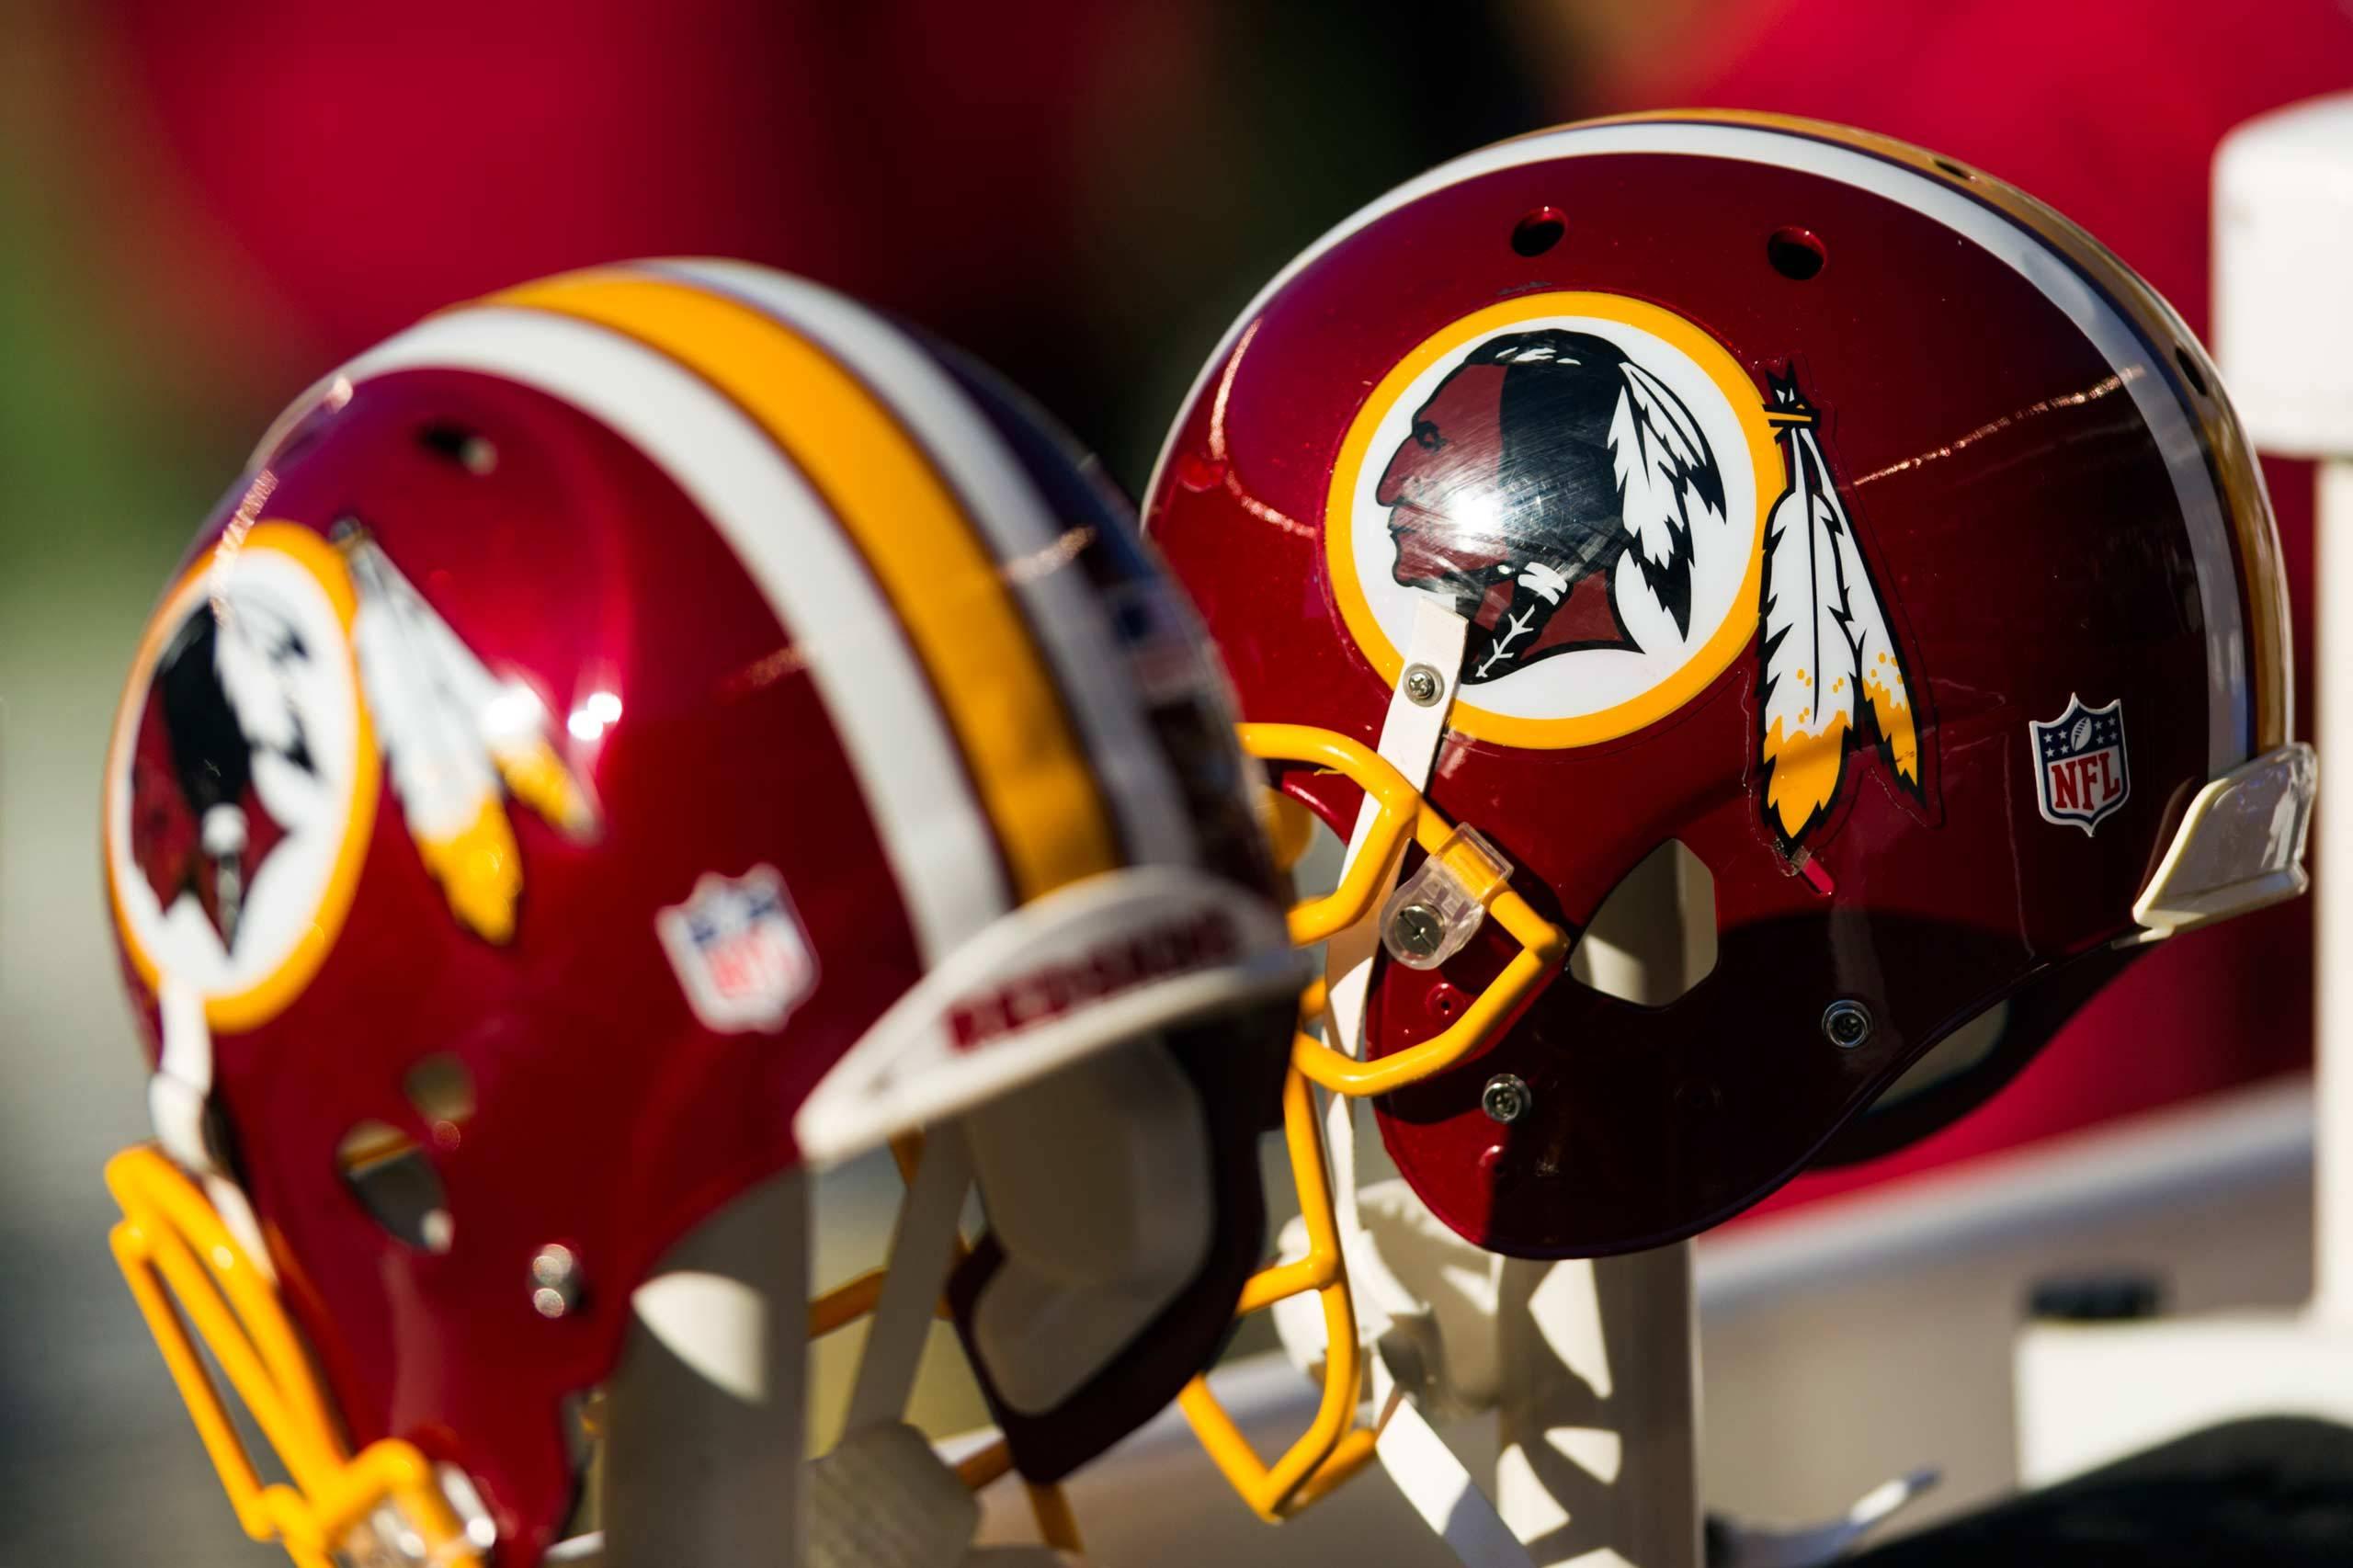 Washington Redskins Helmet Wallpaper Background 55993 2560x1706px 2560x1706